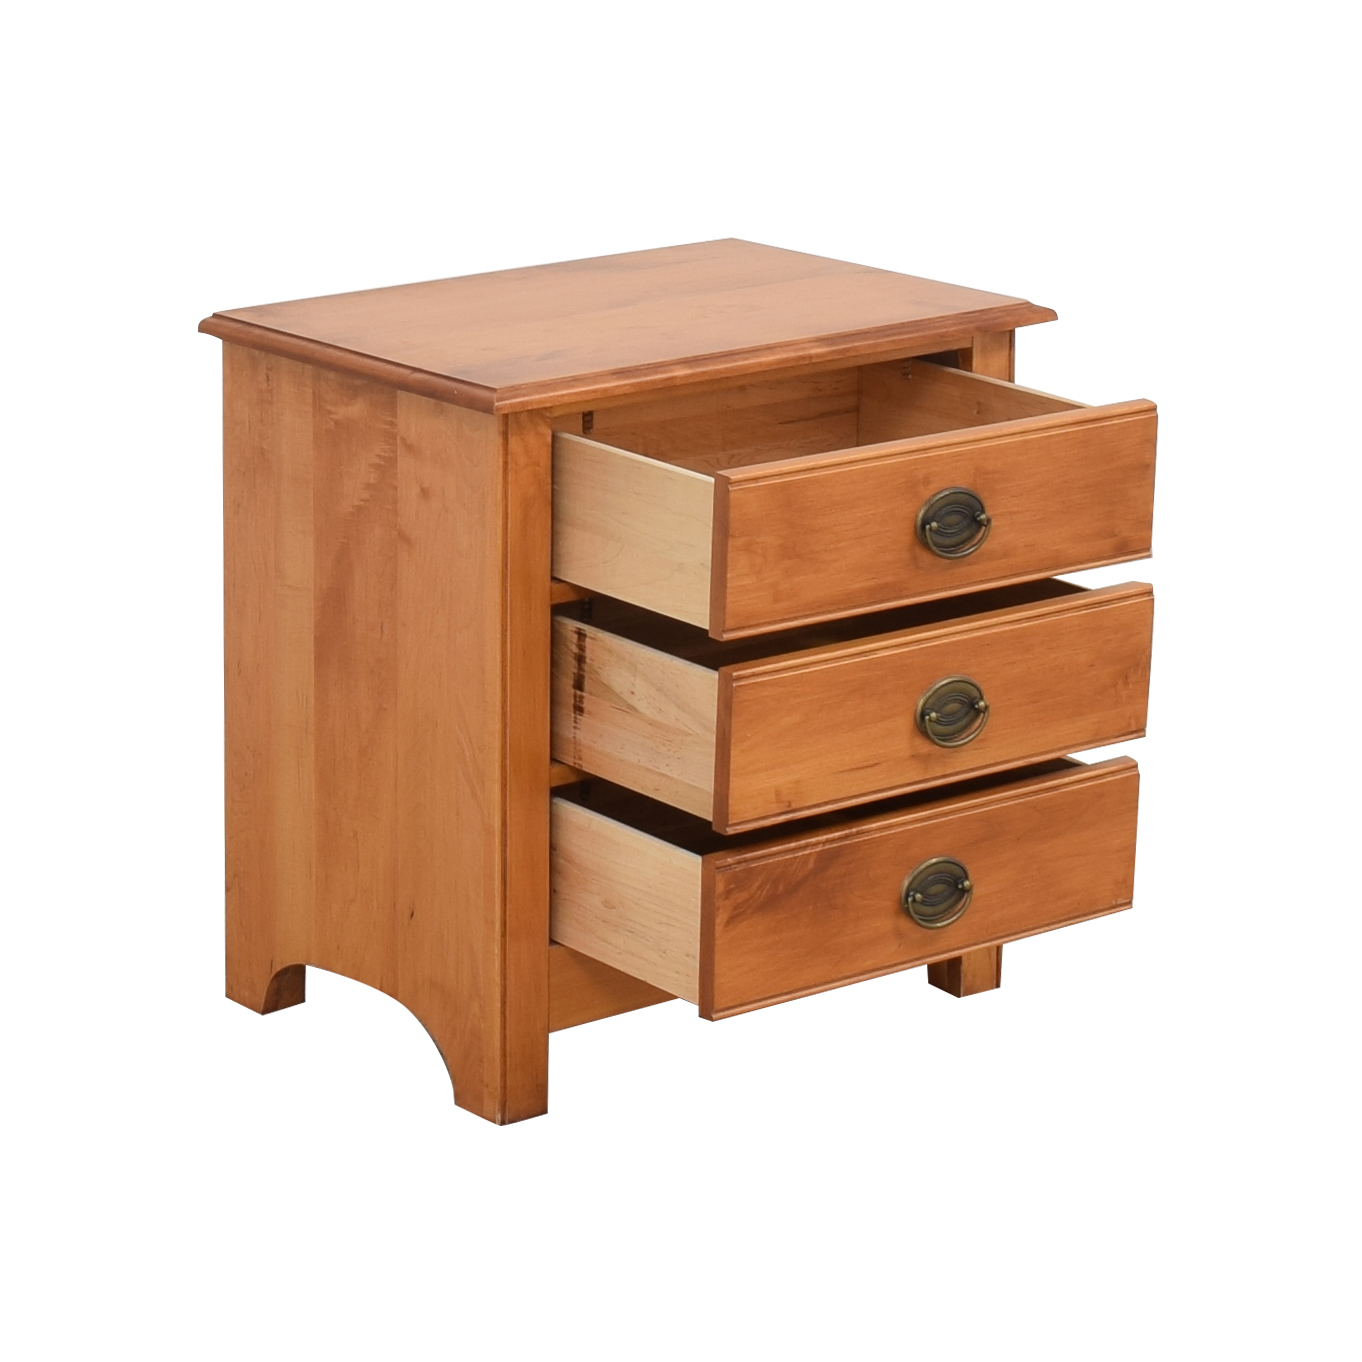 Crawford Furniture Crawford Furniture Nightstand pa